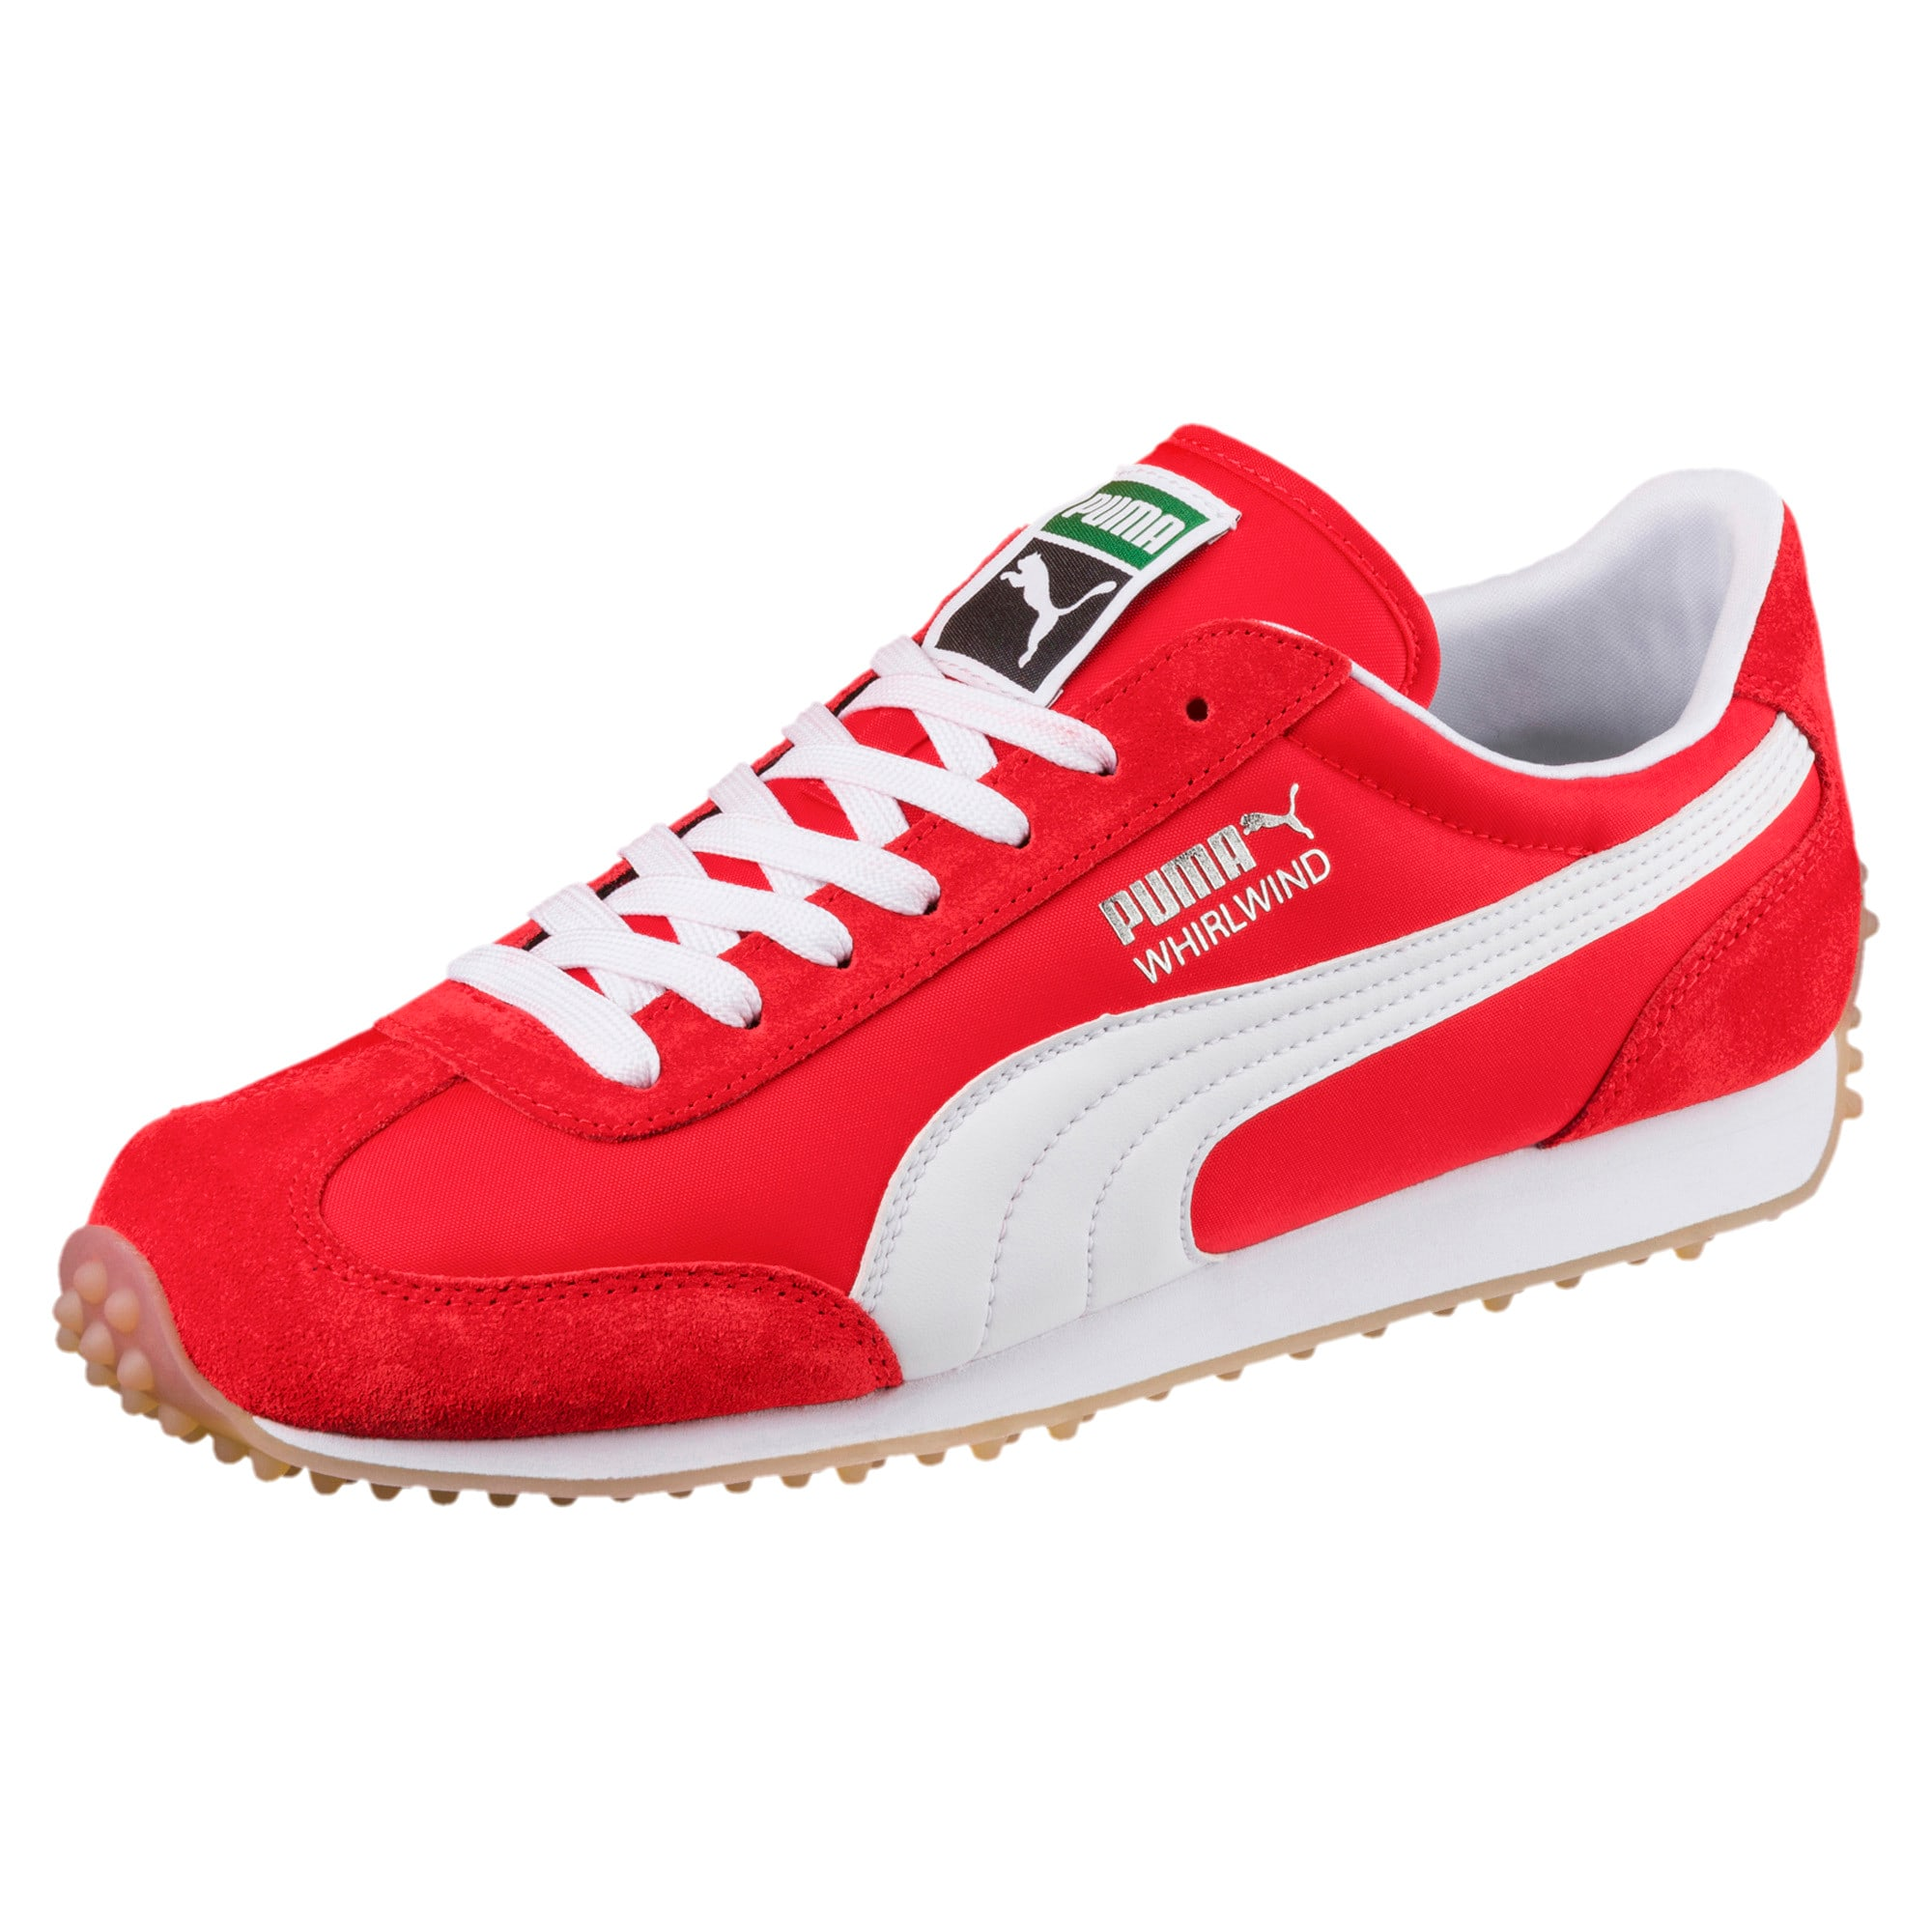 PUMA Archive Whirlwind Classic Sneaker